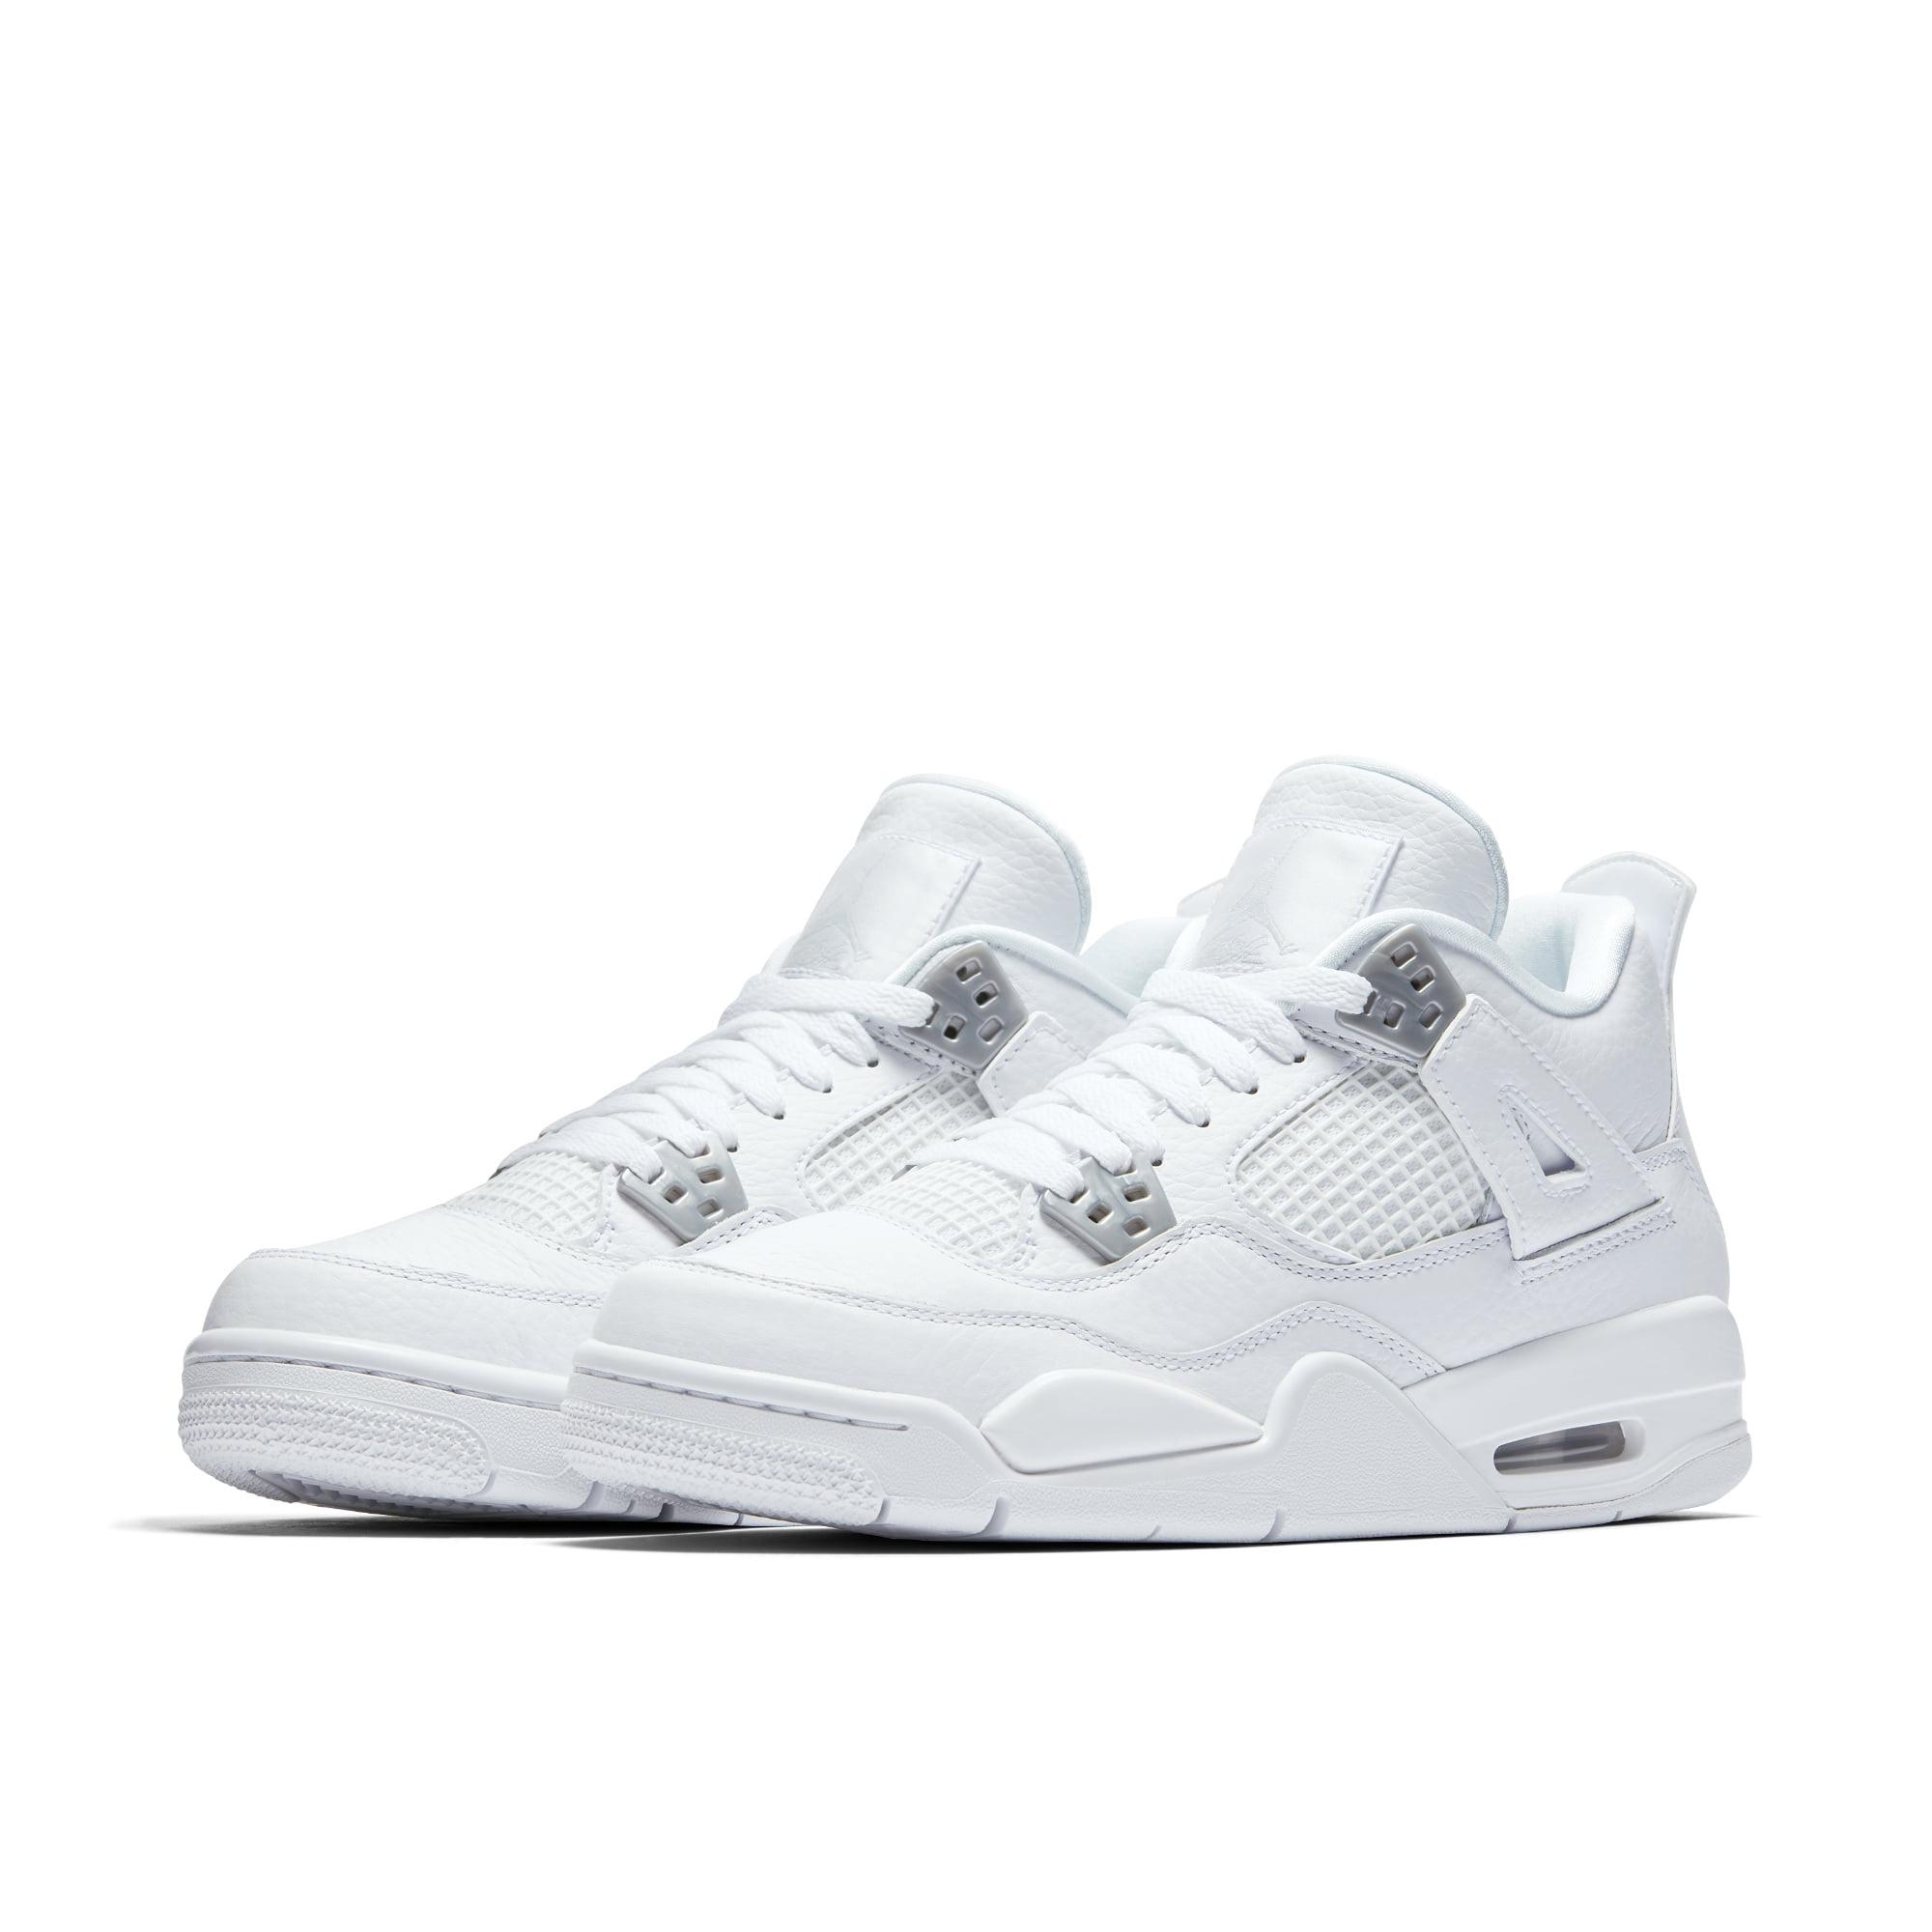 Nike 4 RETRO BG Boys 408452-100